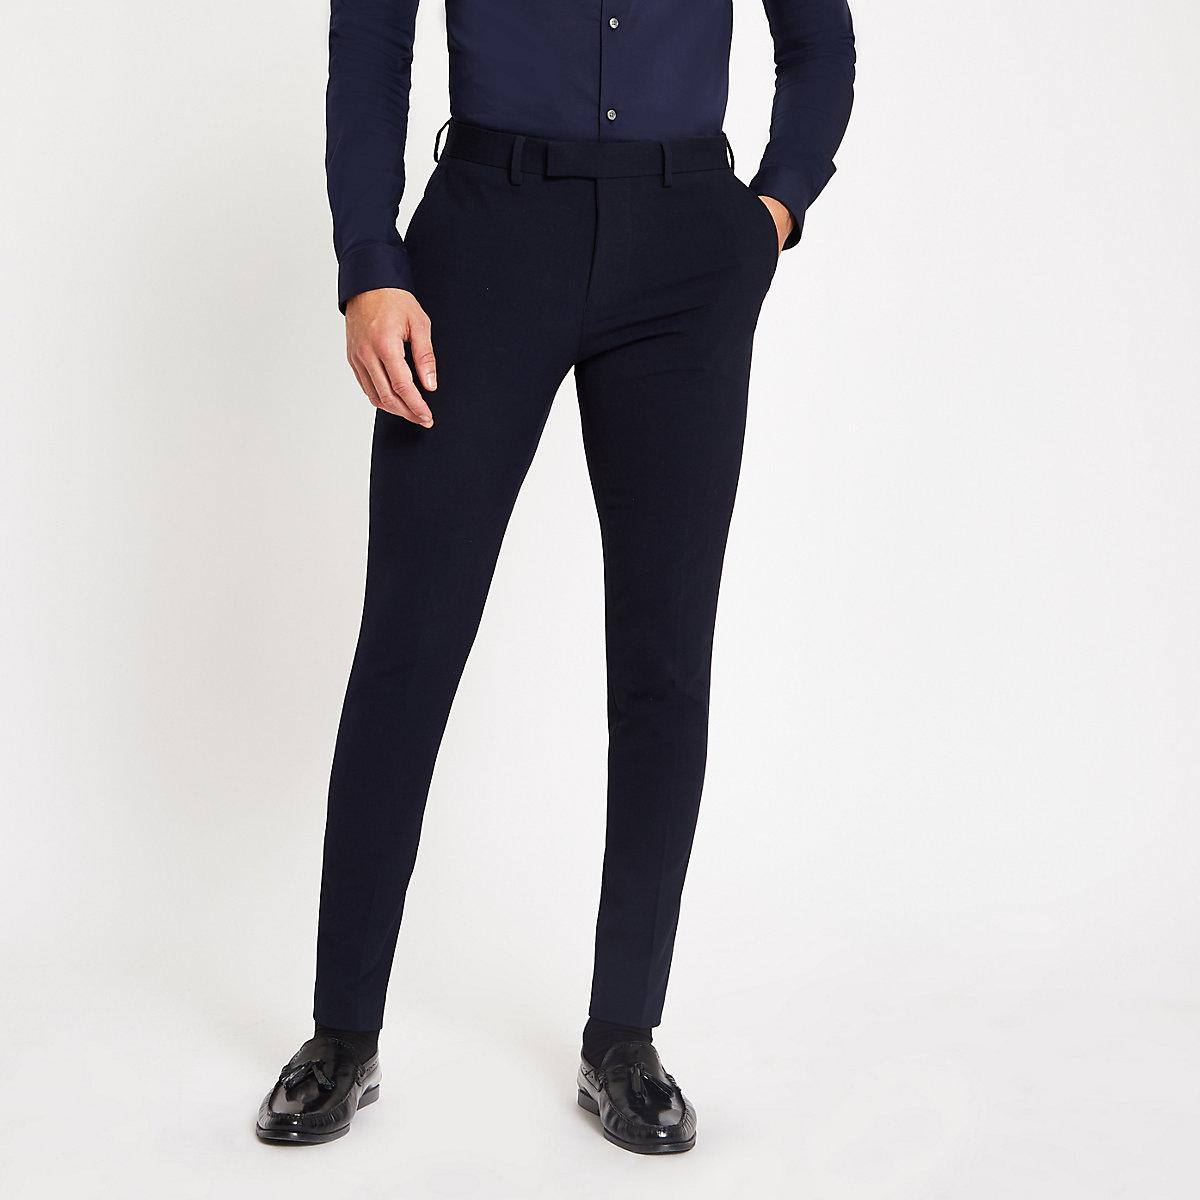 Navy super skinny suit pants